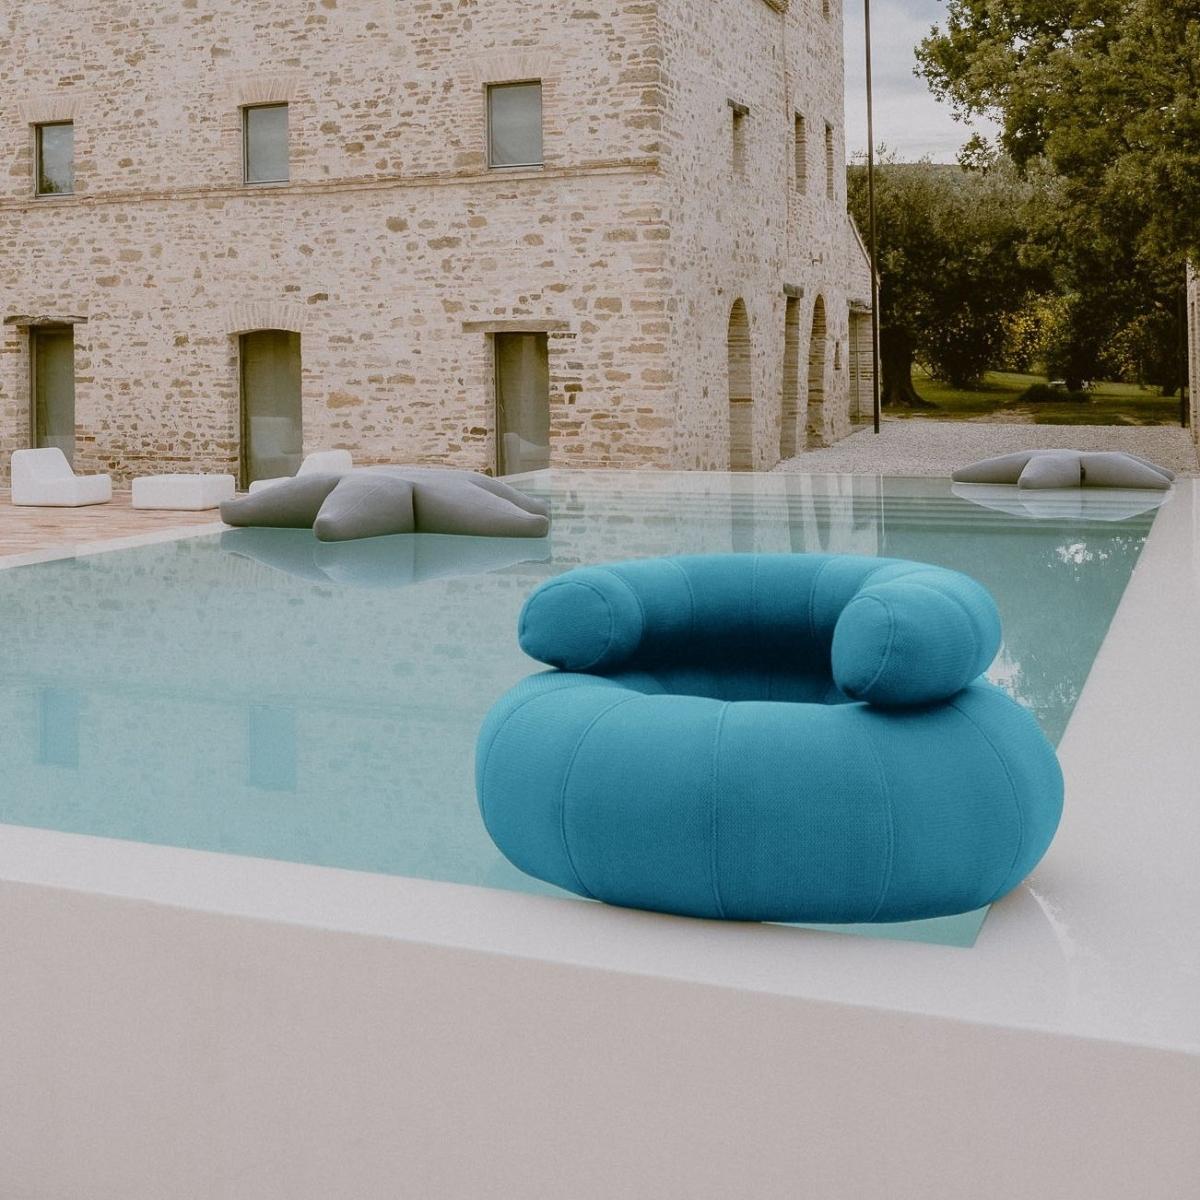 Foto de Don Out Sofa 1 en la piscina modelo L acabado BLUE. OGO